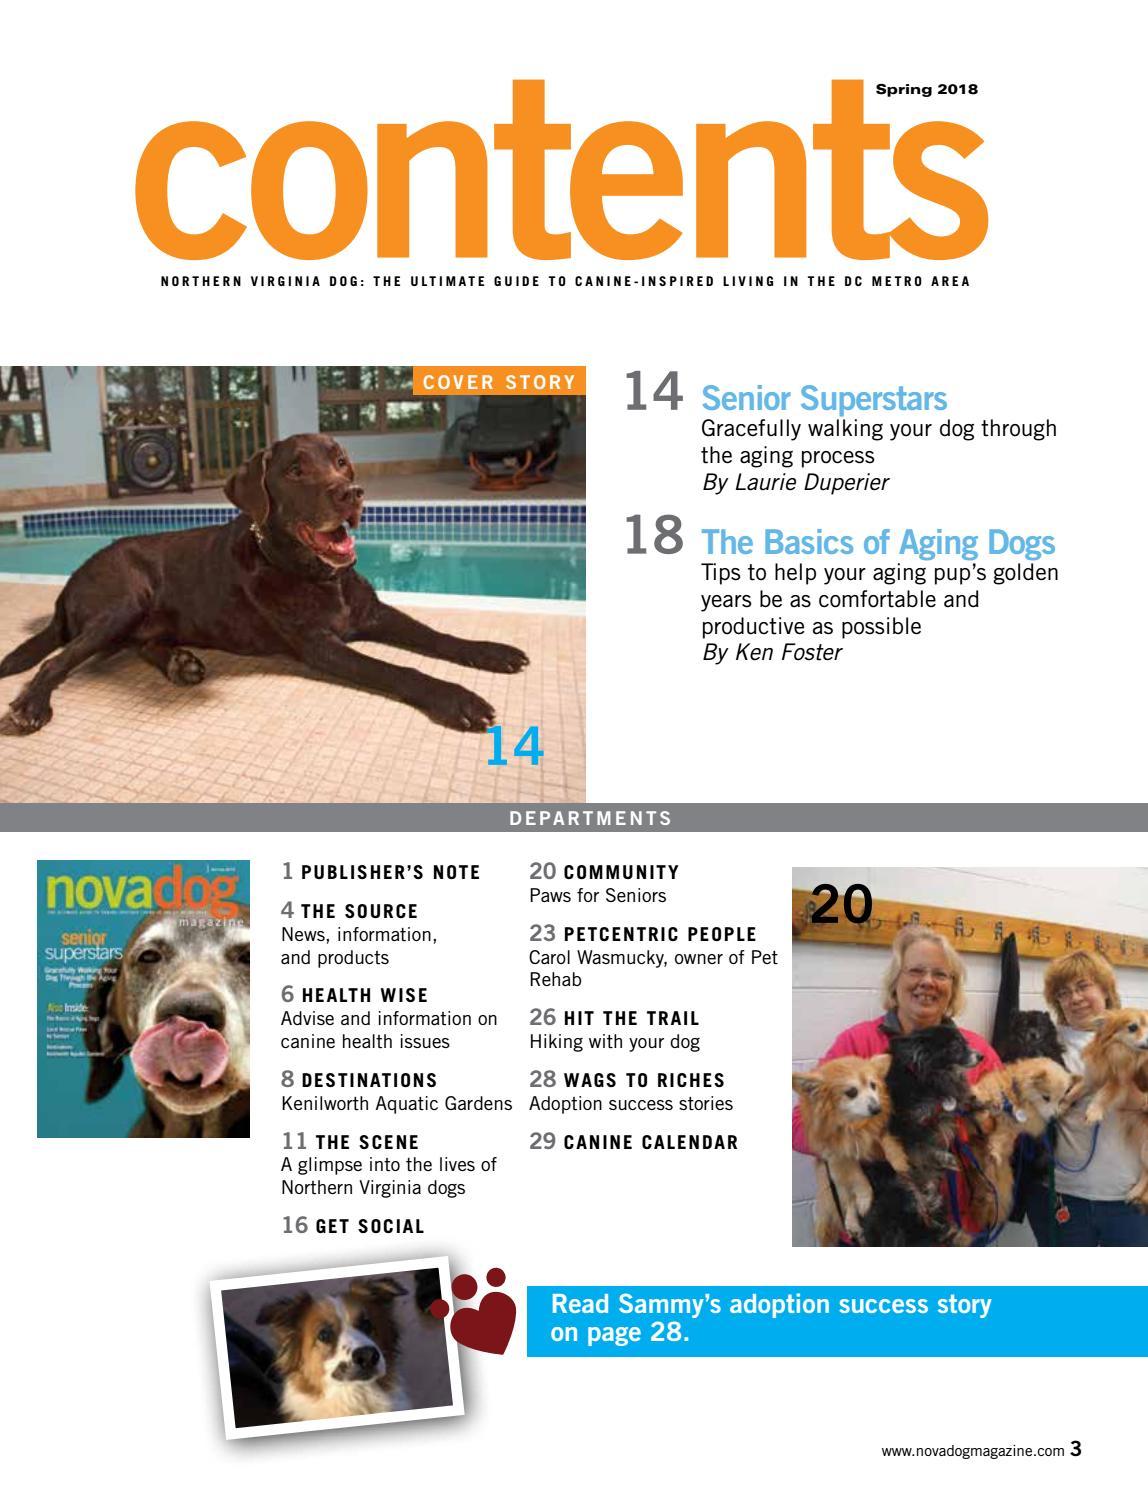 NOVADog Magazine Spring 2018 by 343 Media, LLC - issuu